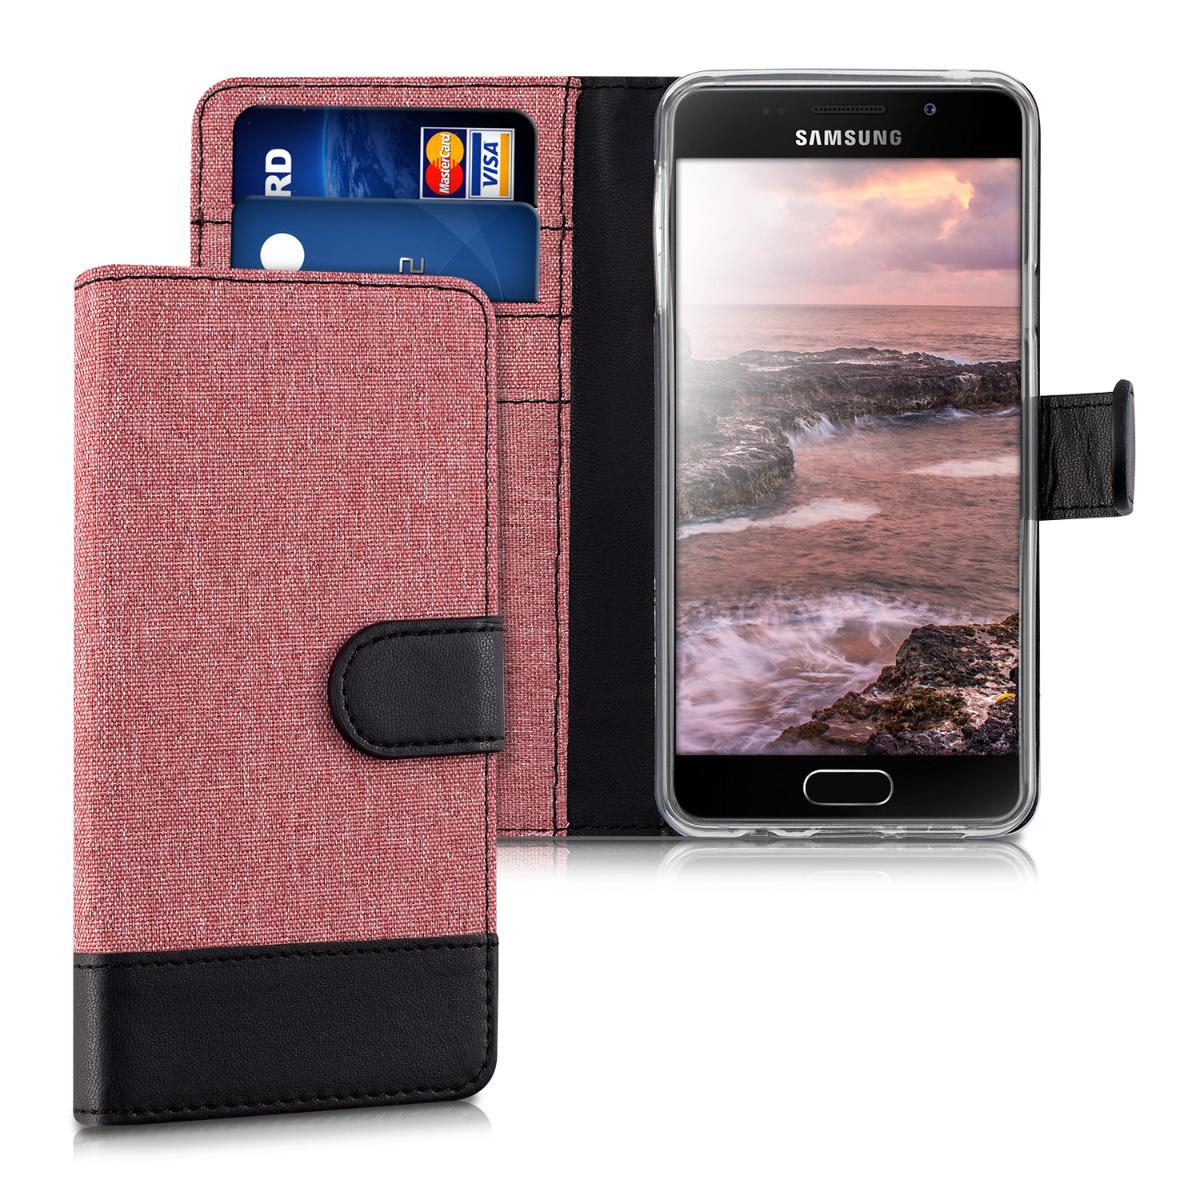 Fabricpouzdro pro Samsung A3 (2016) - Dusty růžové / černé